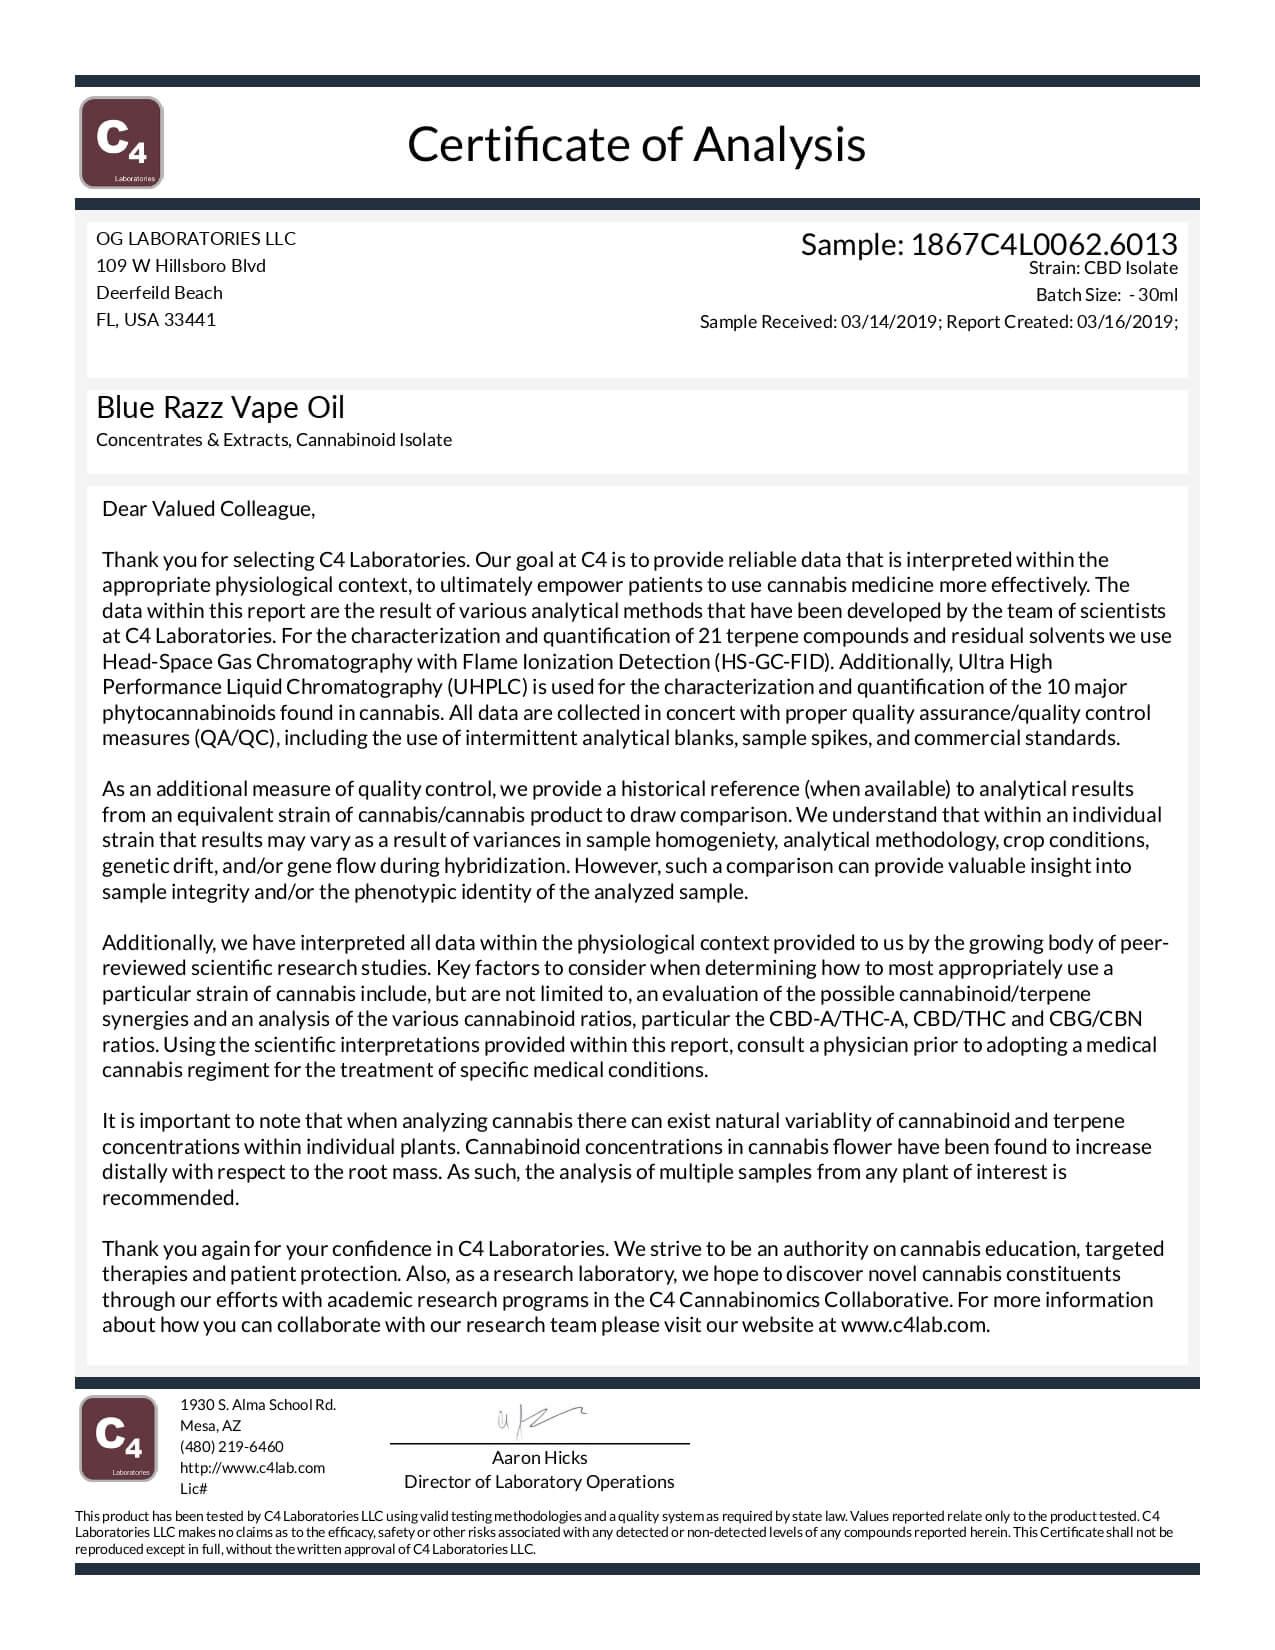 OG Labs CBD Vape Juice Blue Razz 600mg Lab Report